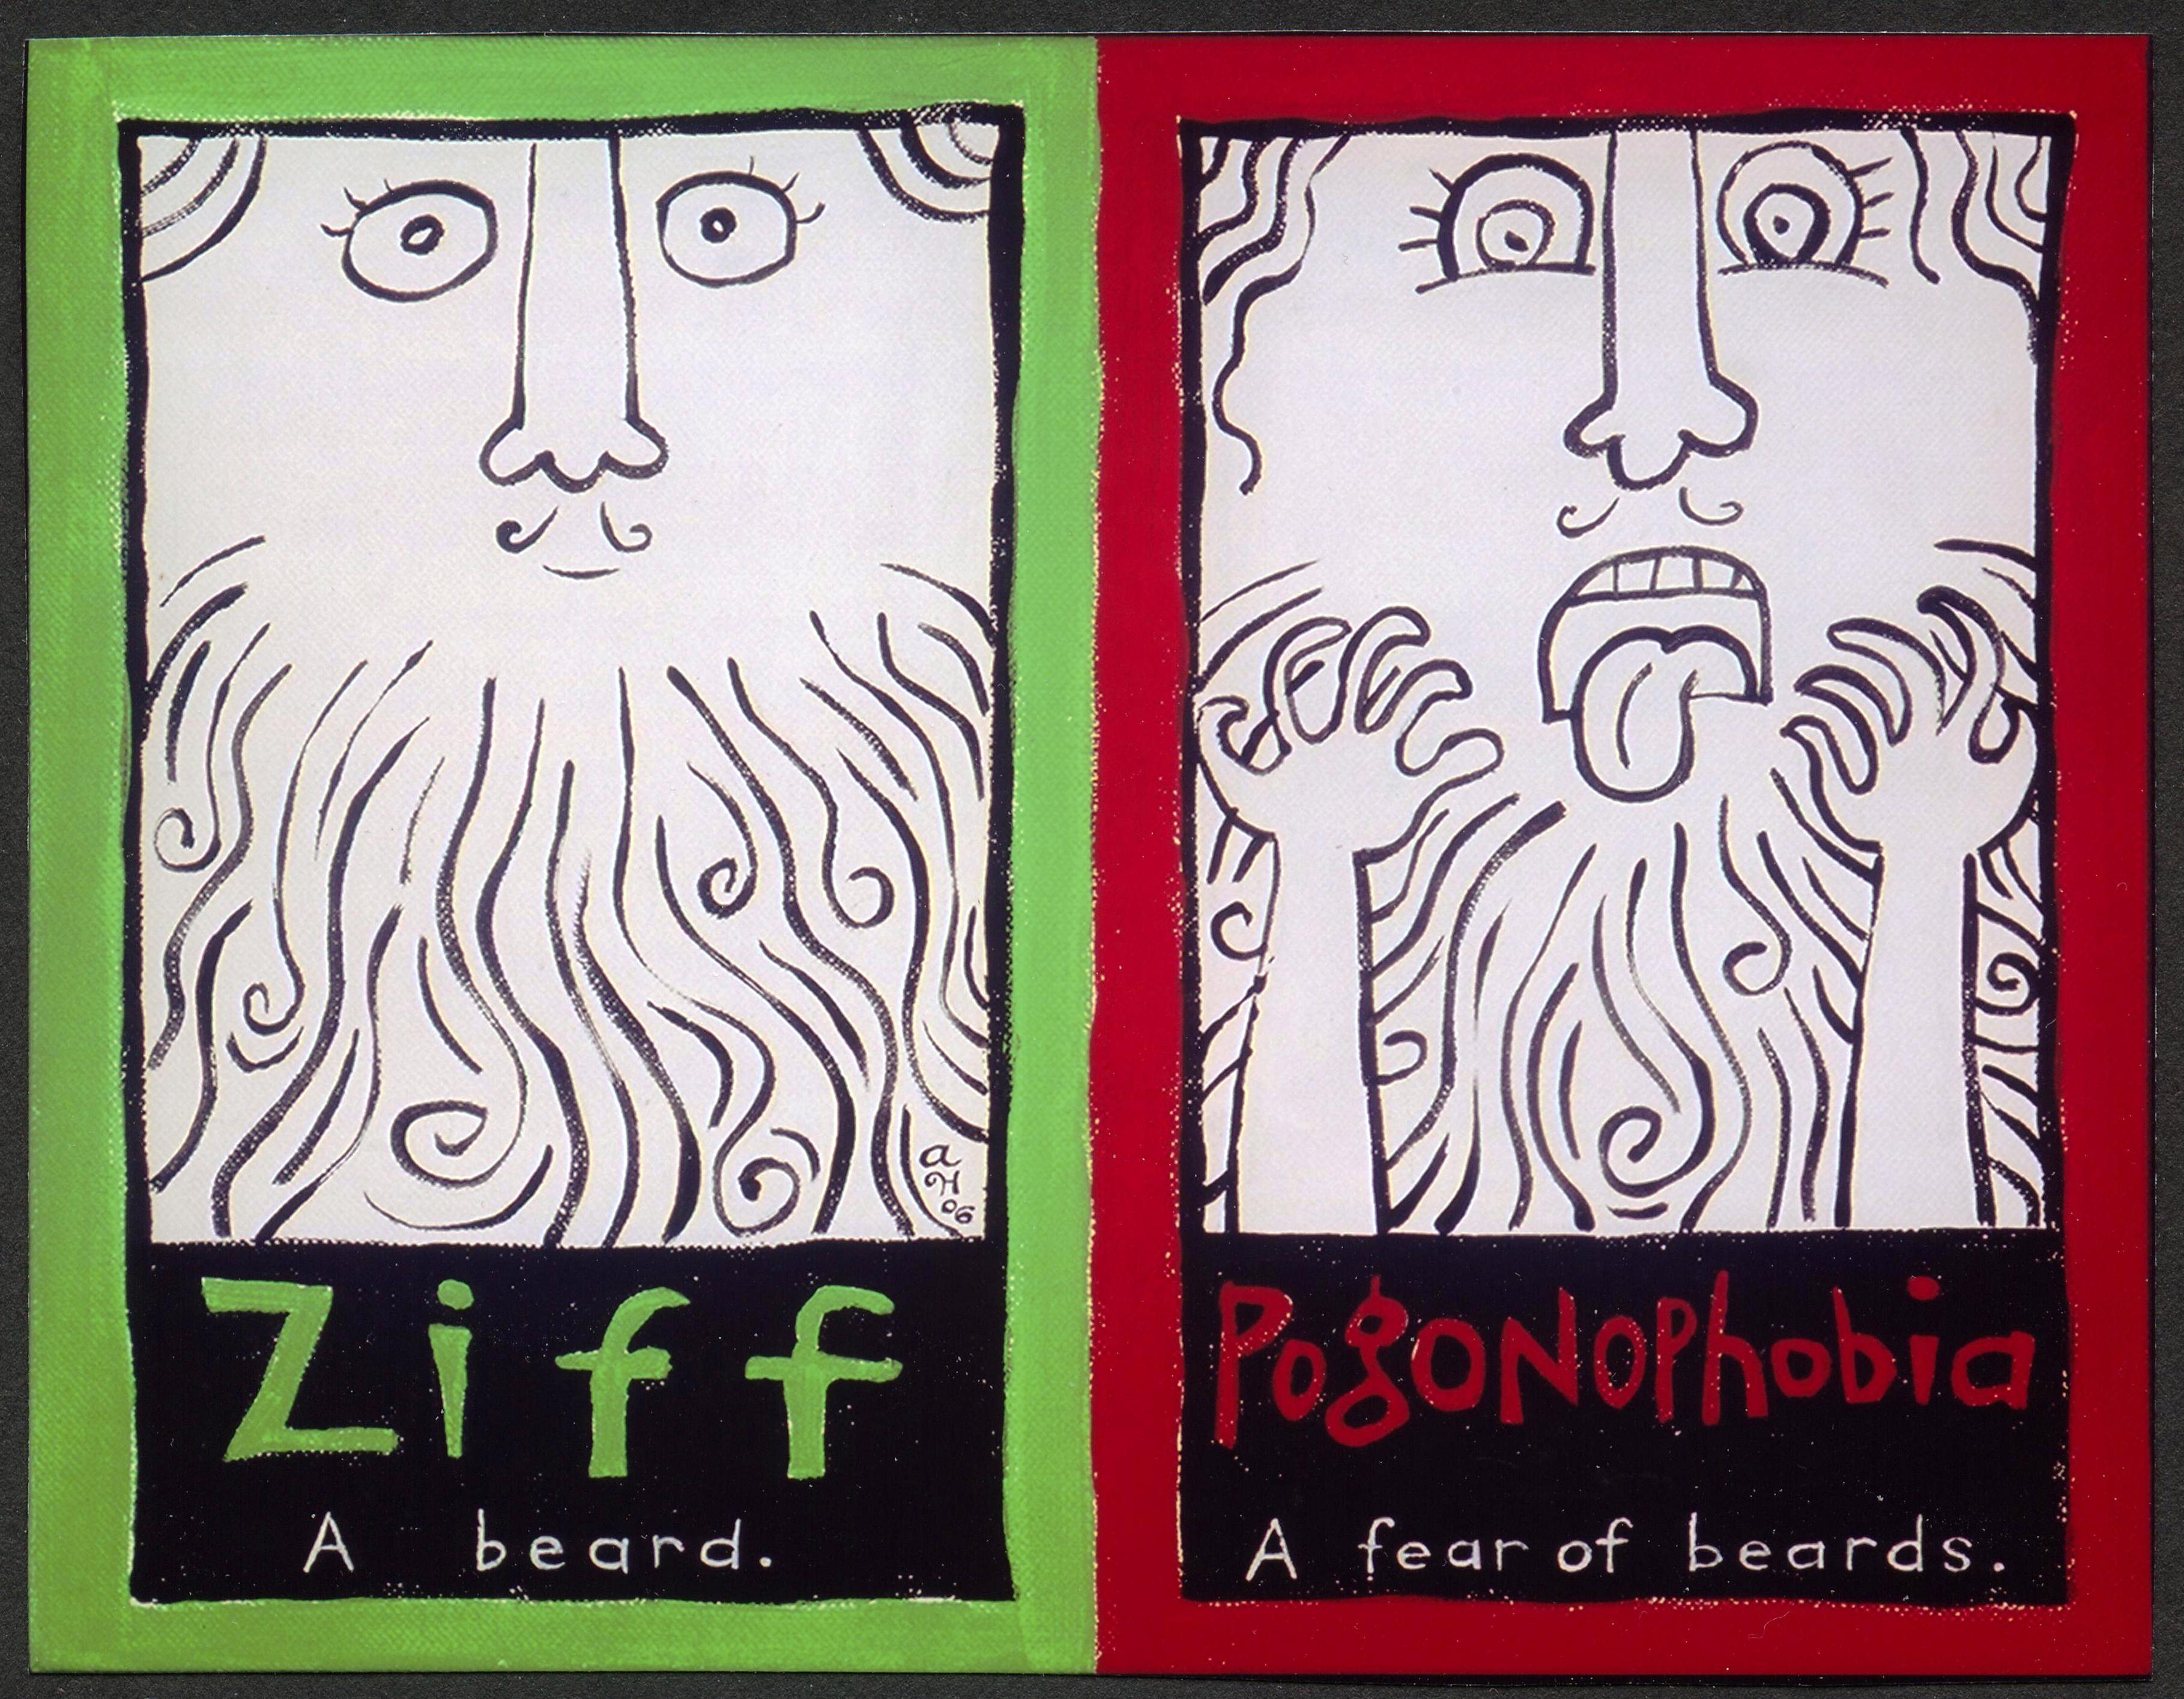 Ziff / Pogonophobia